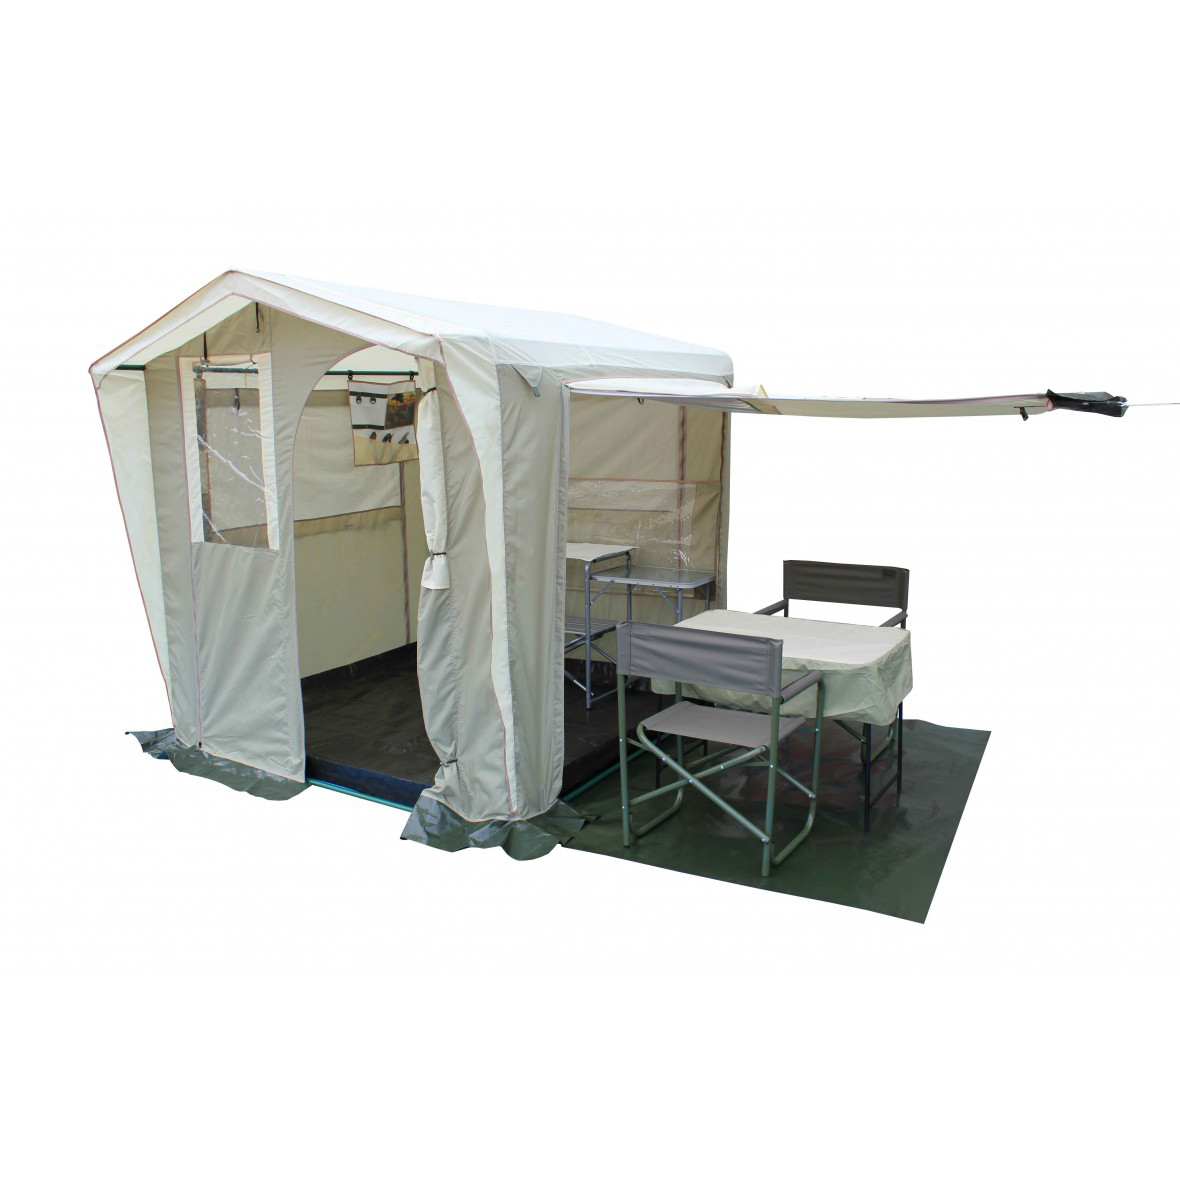 Палатка-Кухня Митек Люкс 2,0х2,0 хаки-бежевый